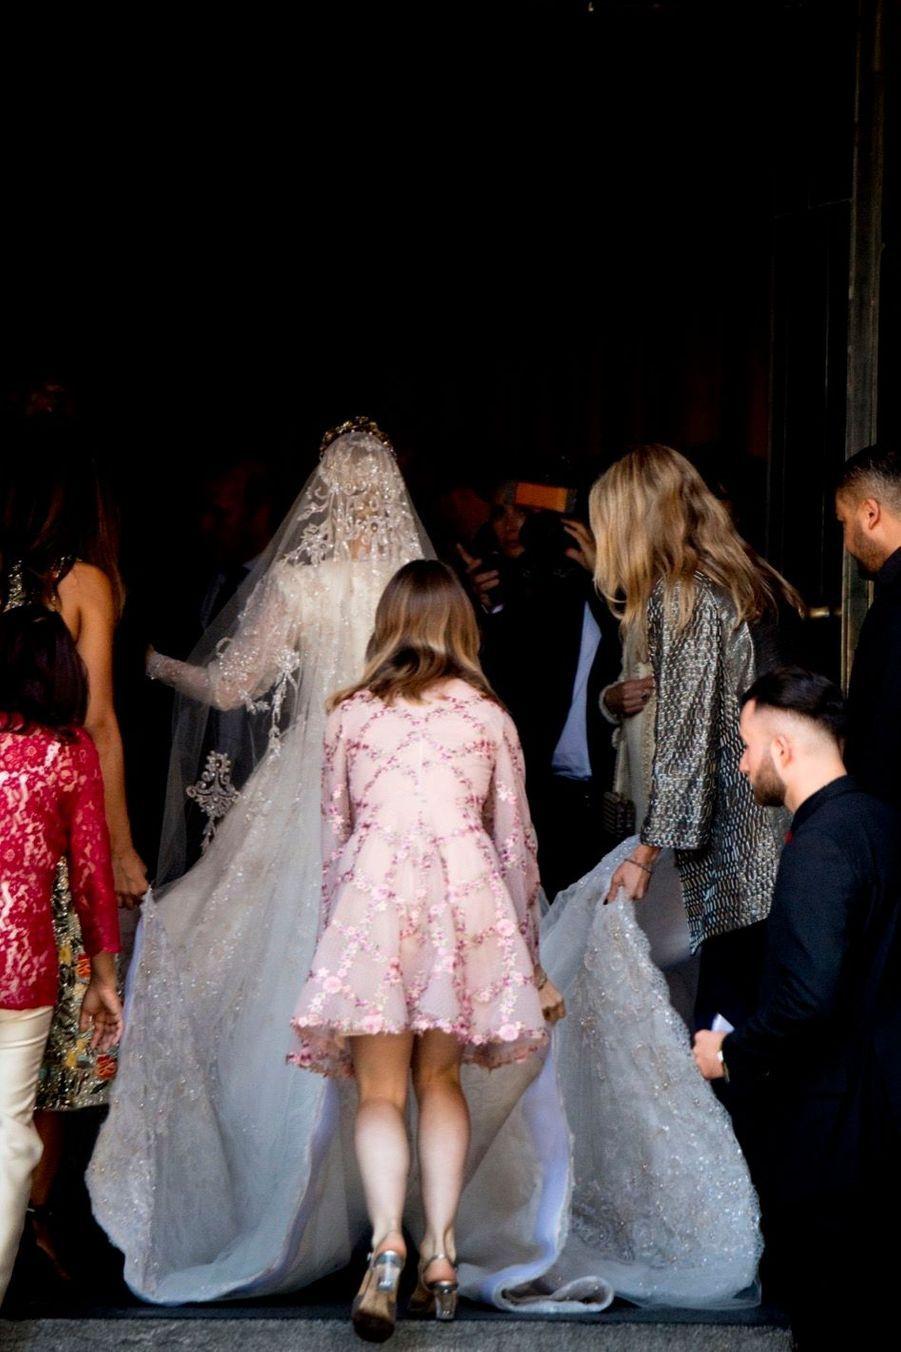 Le Mariage Du Prince Ernst August De Hanovre Et Ekaterina Malysheva, Le Samedi 8 Juillet 2017 À Hanovre 12